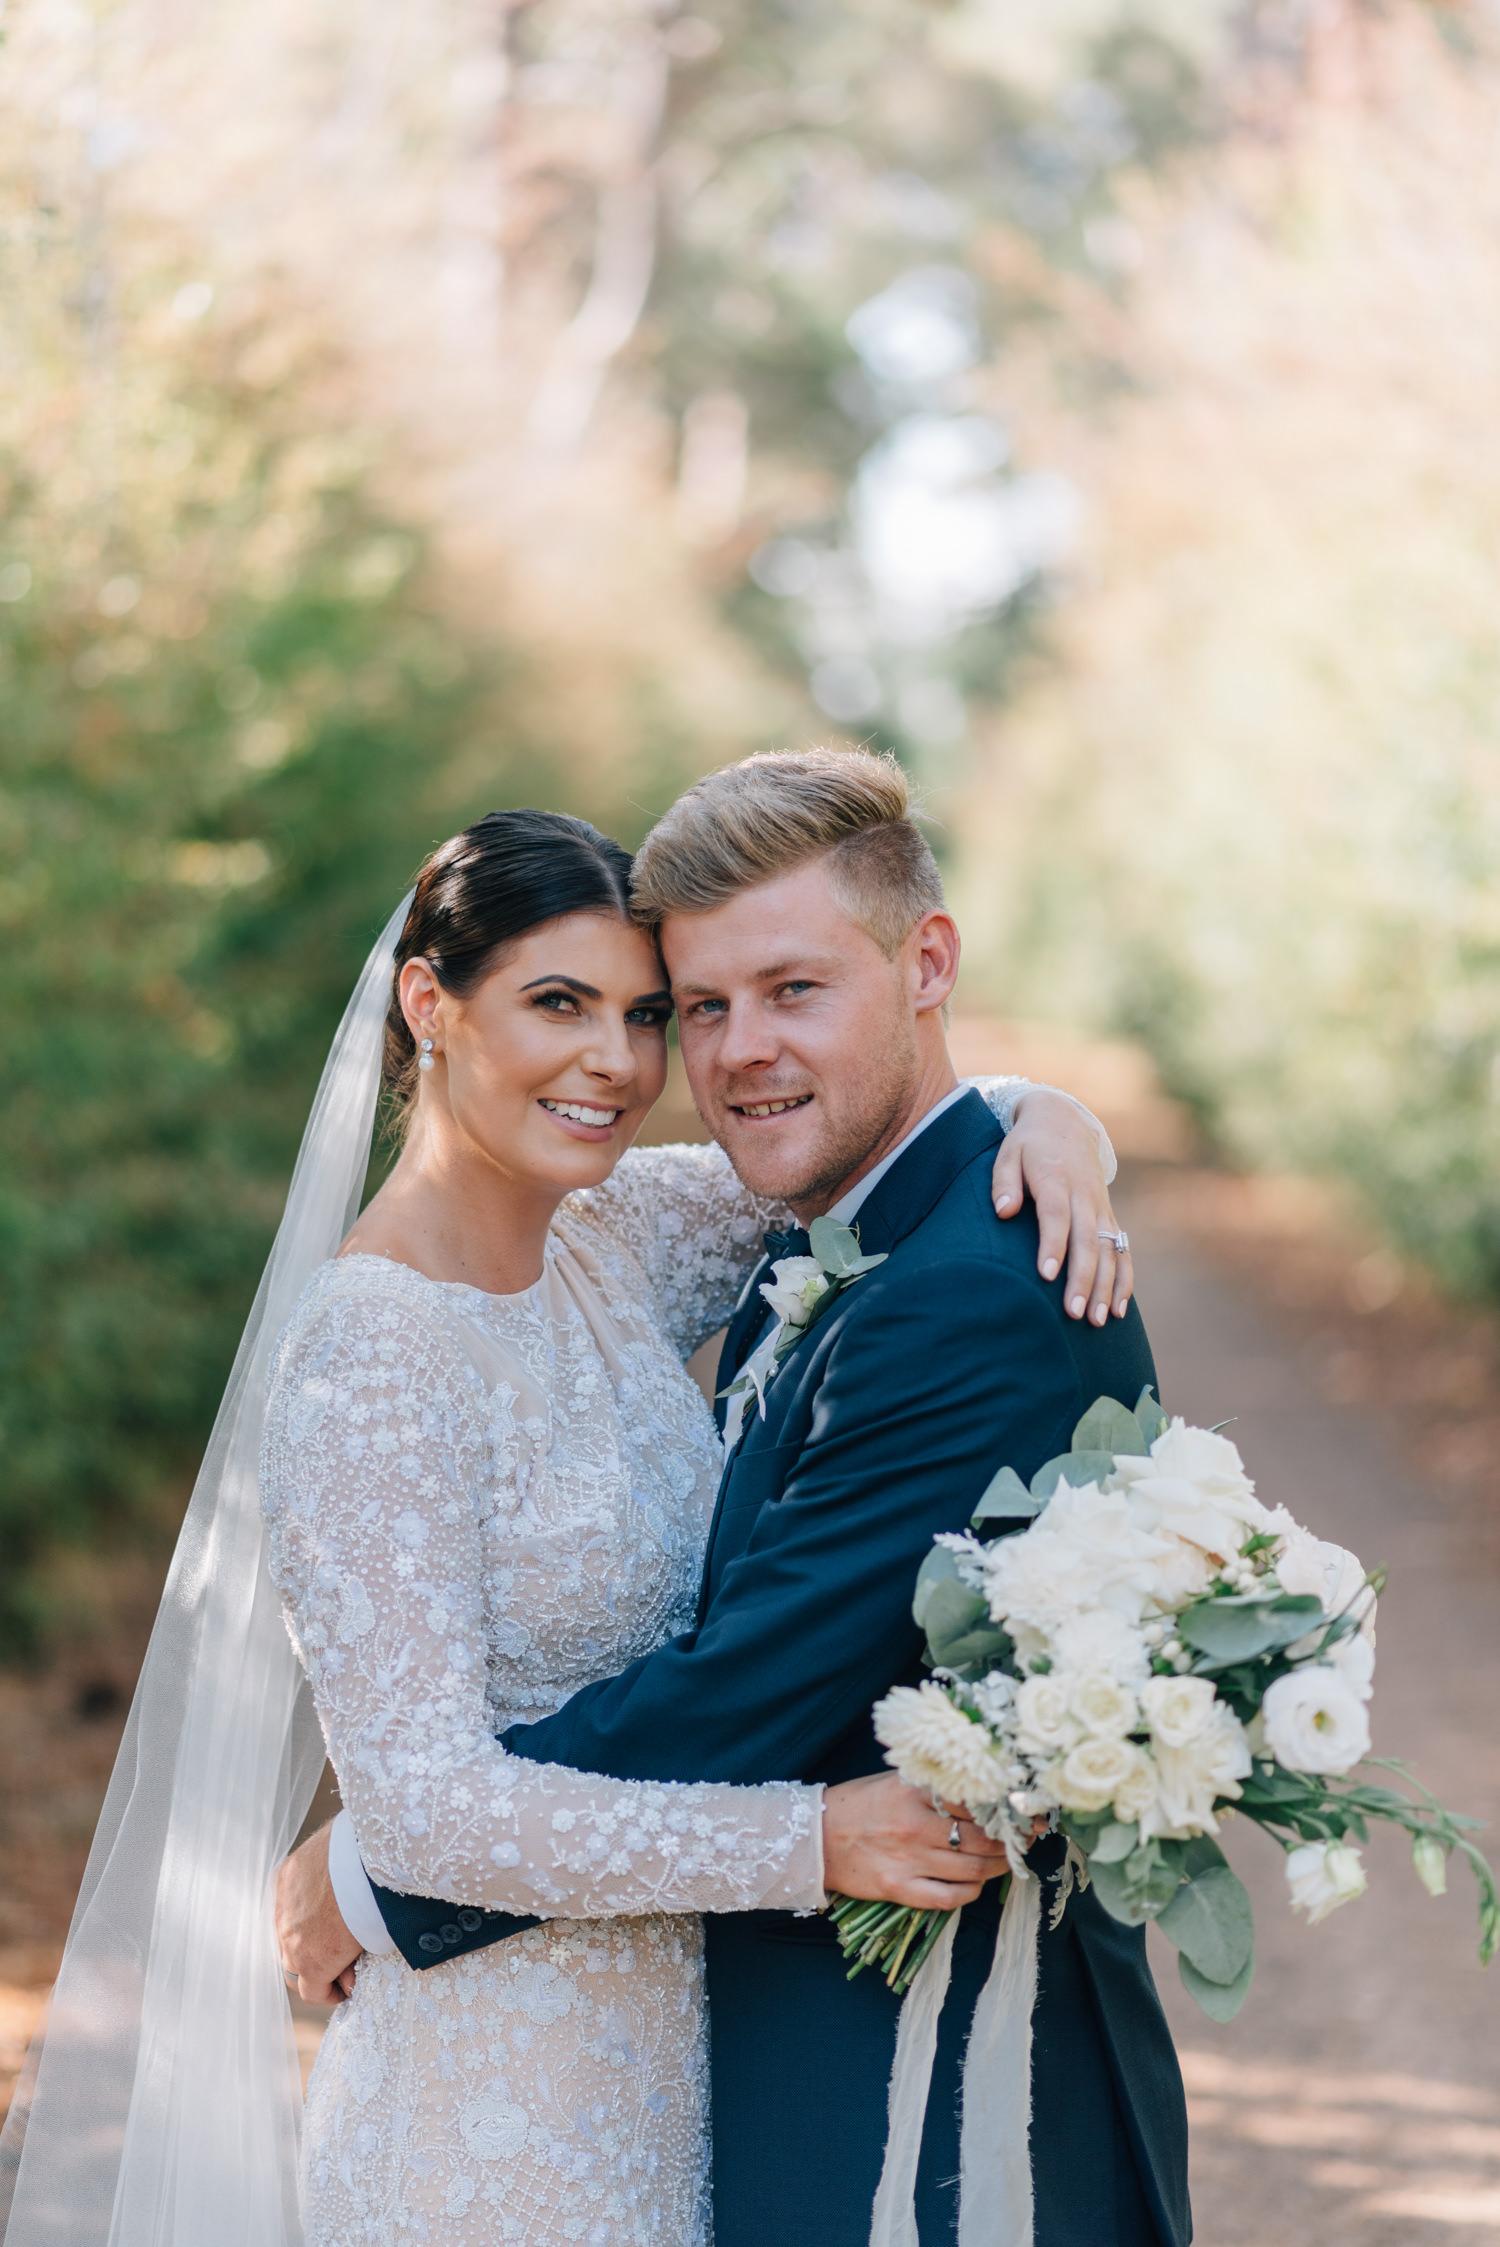 Quamby-Wedding-Photography-90.jpg